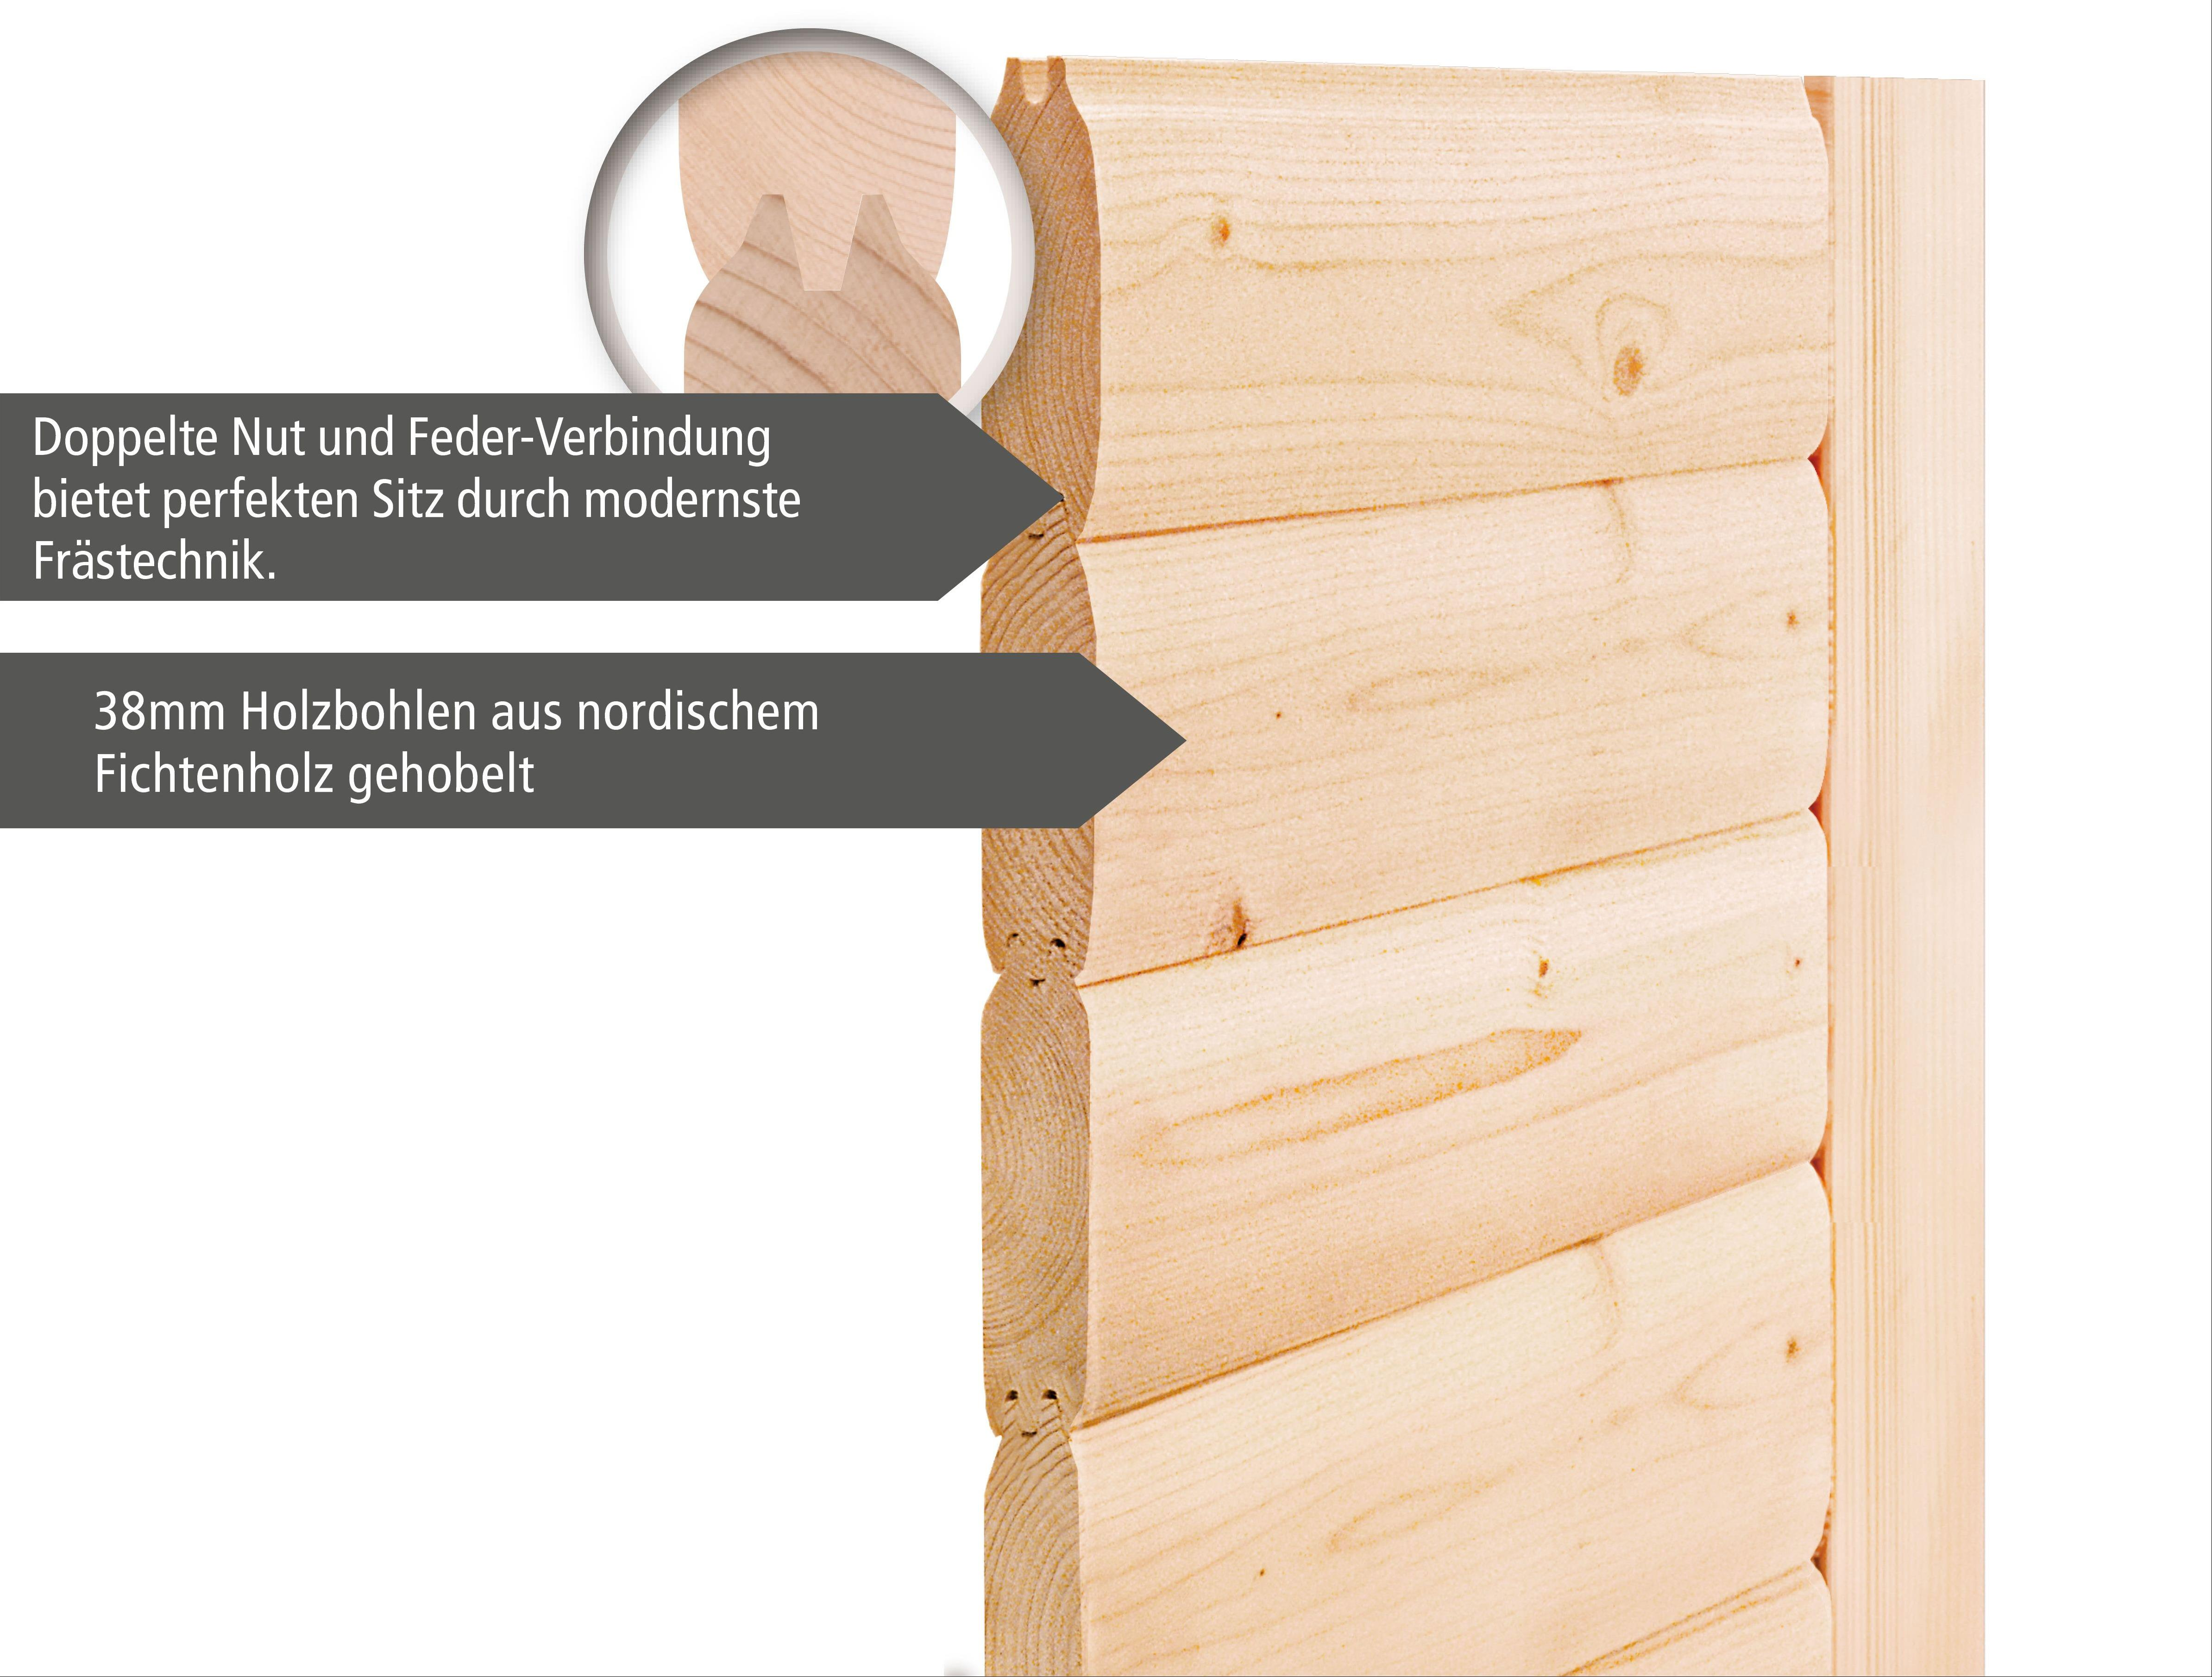 Woodfeeling Sauna Leona 38mm Ofen 9kW extern Tür Holz Bild 5